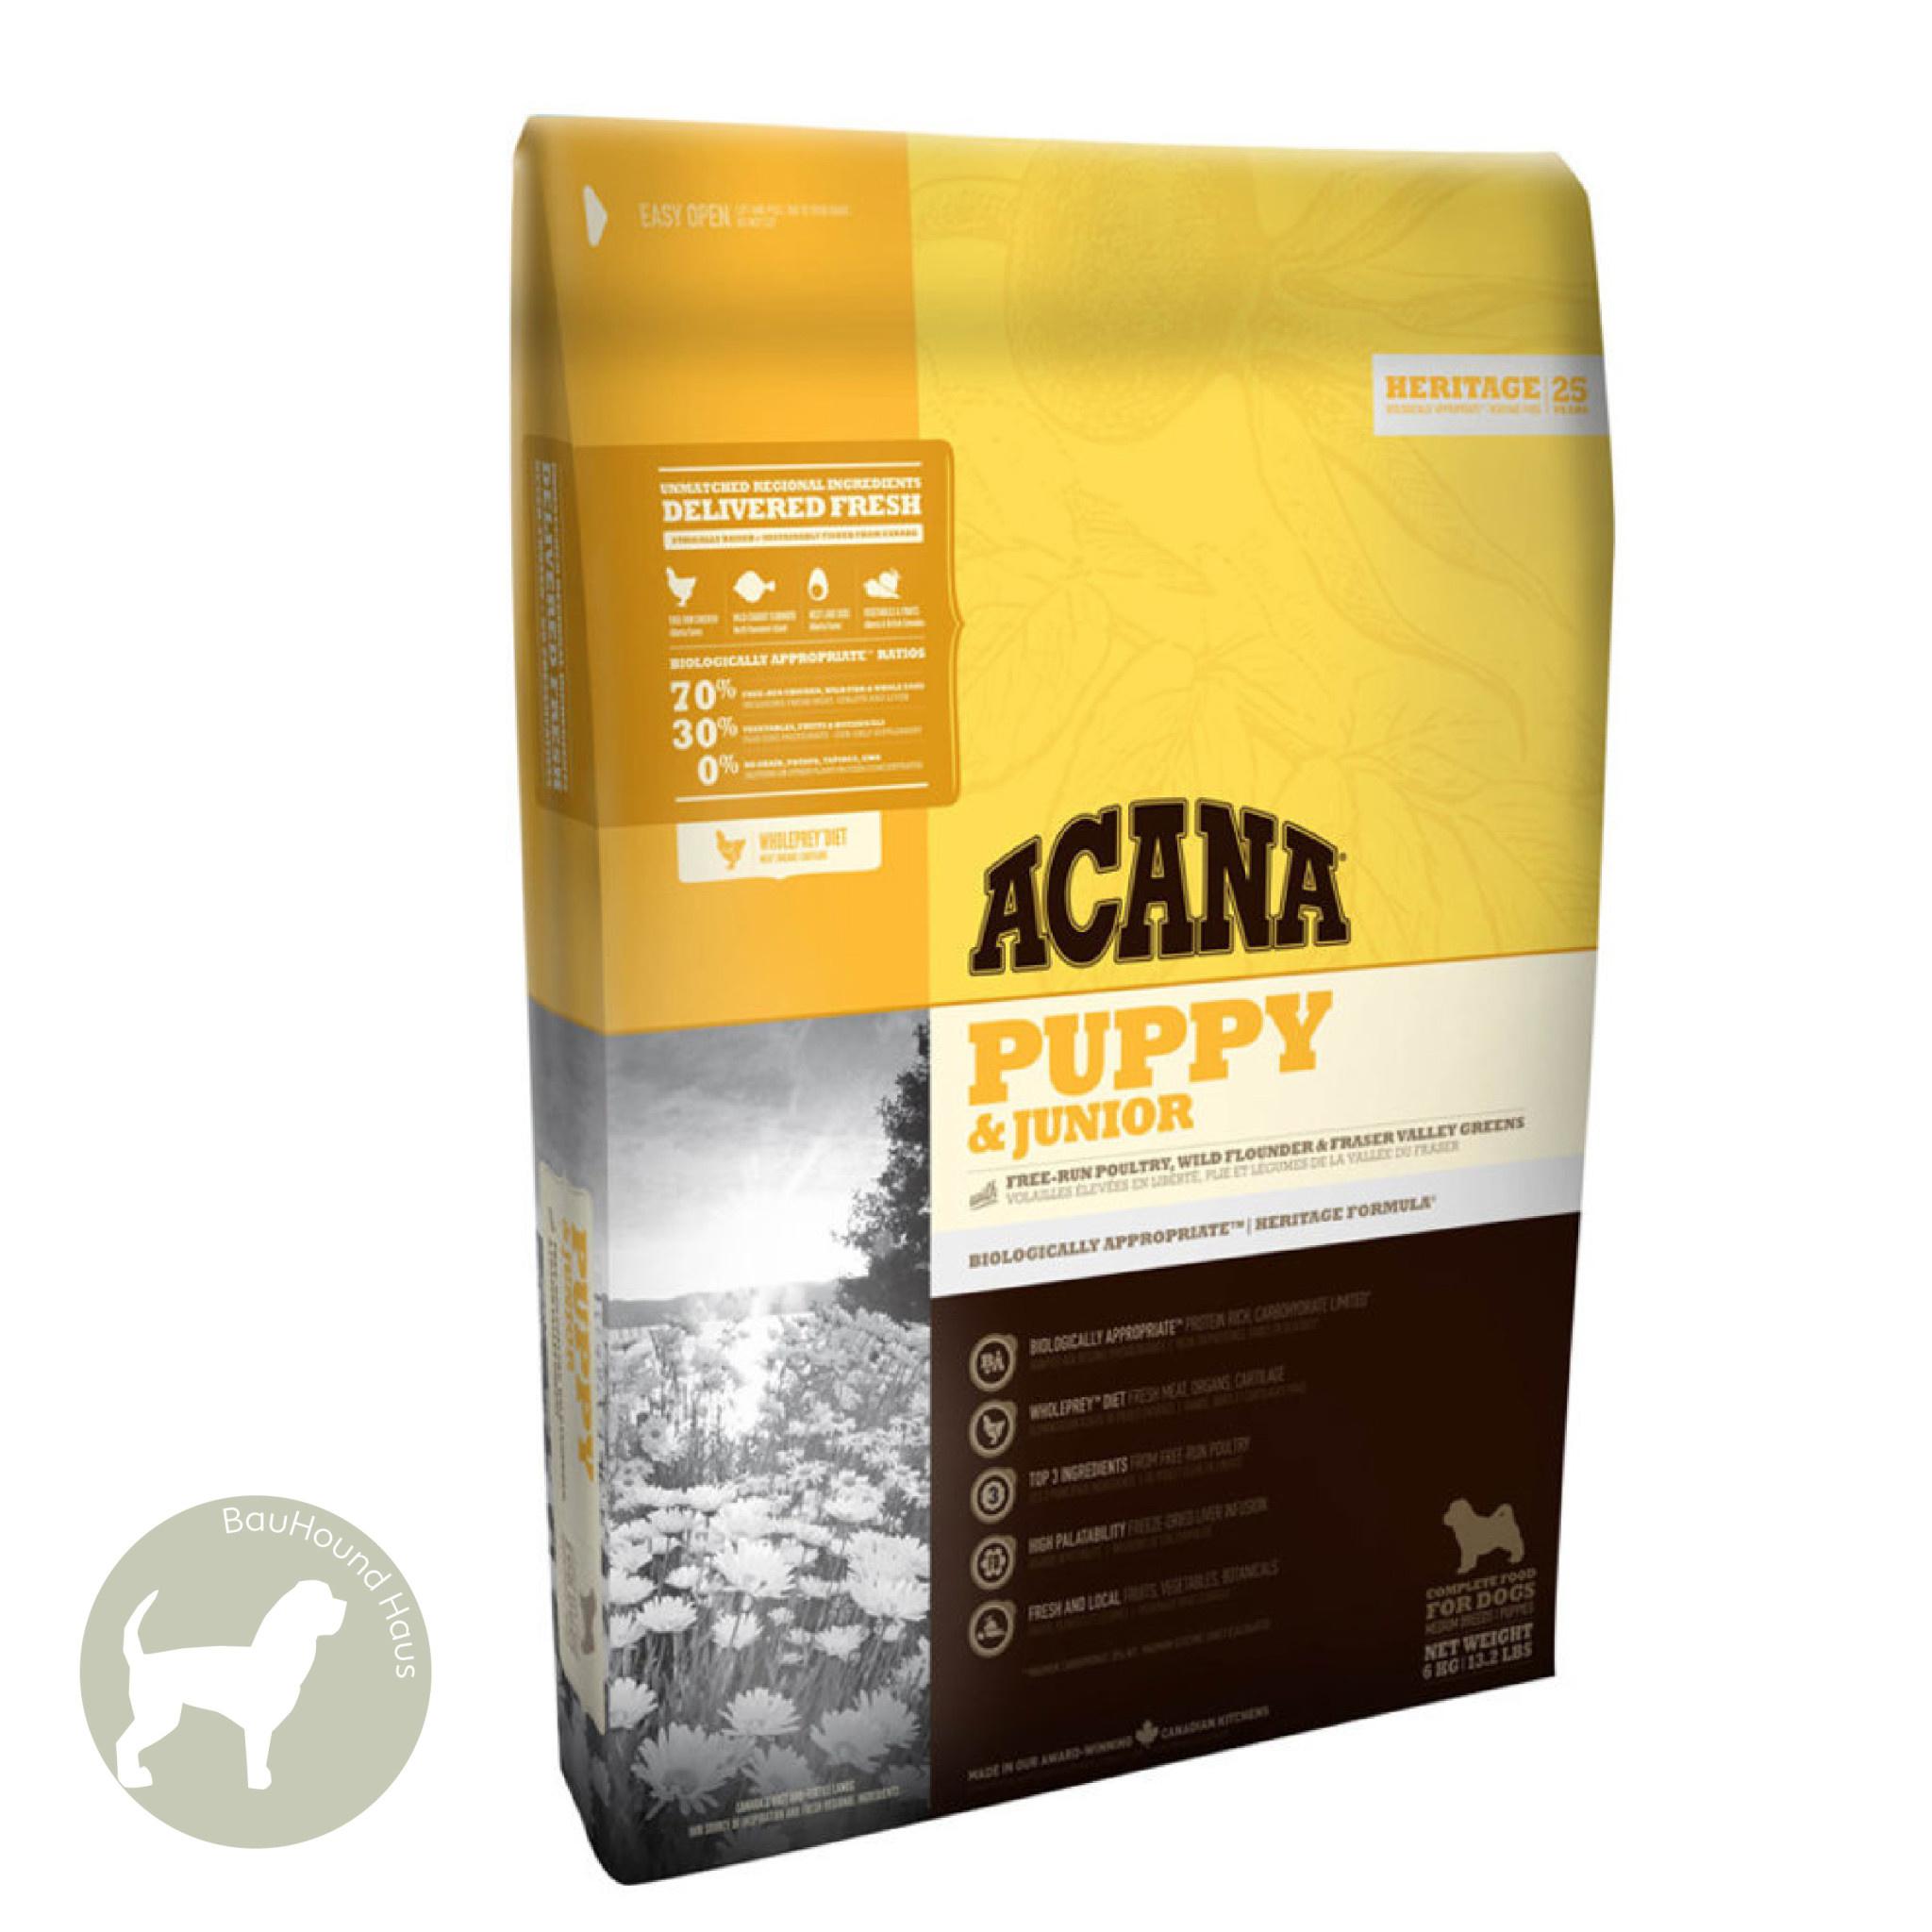 Acana Acana HERITAGE Puppy & Junior Kibble, 2kg